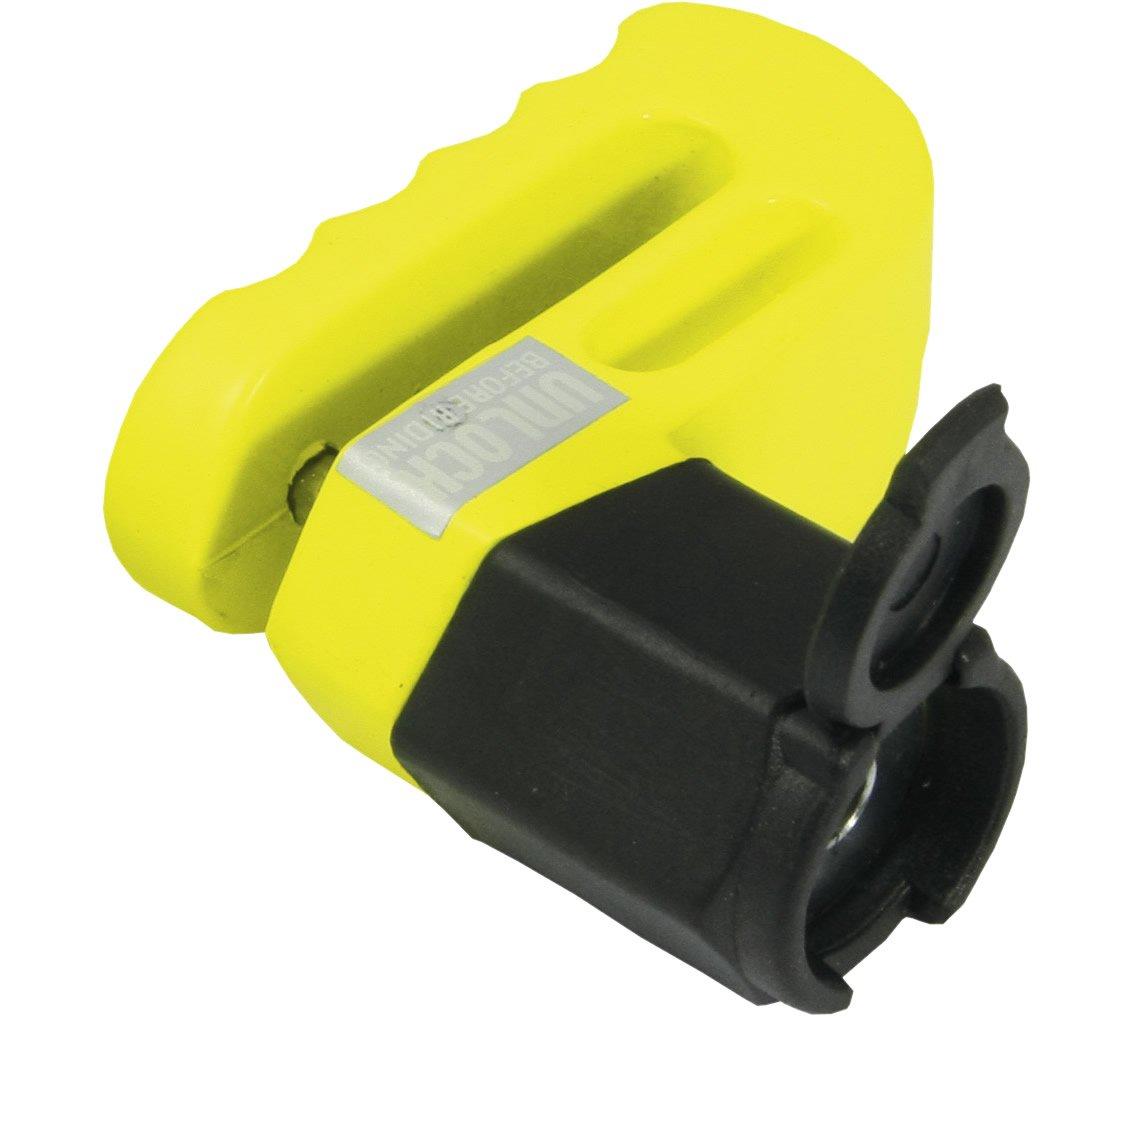 6MM ORIGINAL DISC LOCK Motorcycle micro disc lock safe